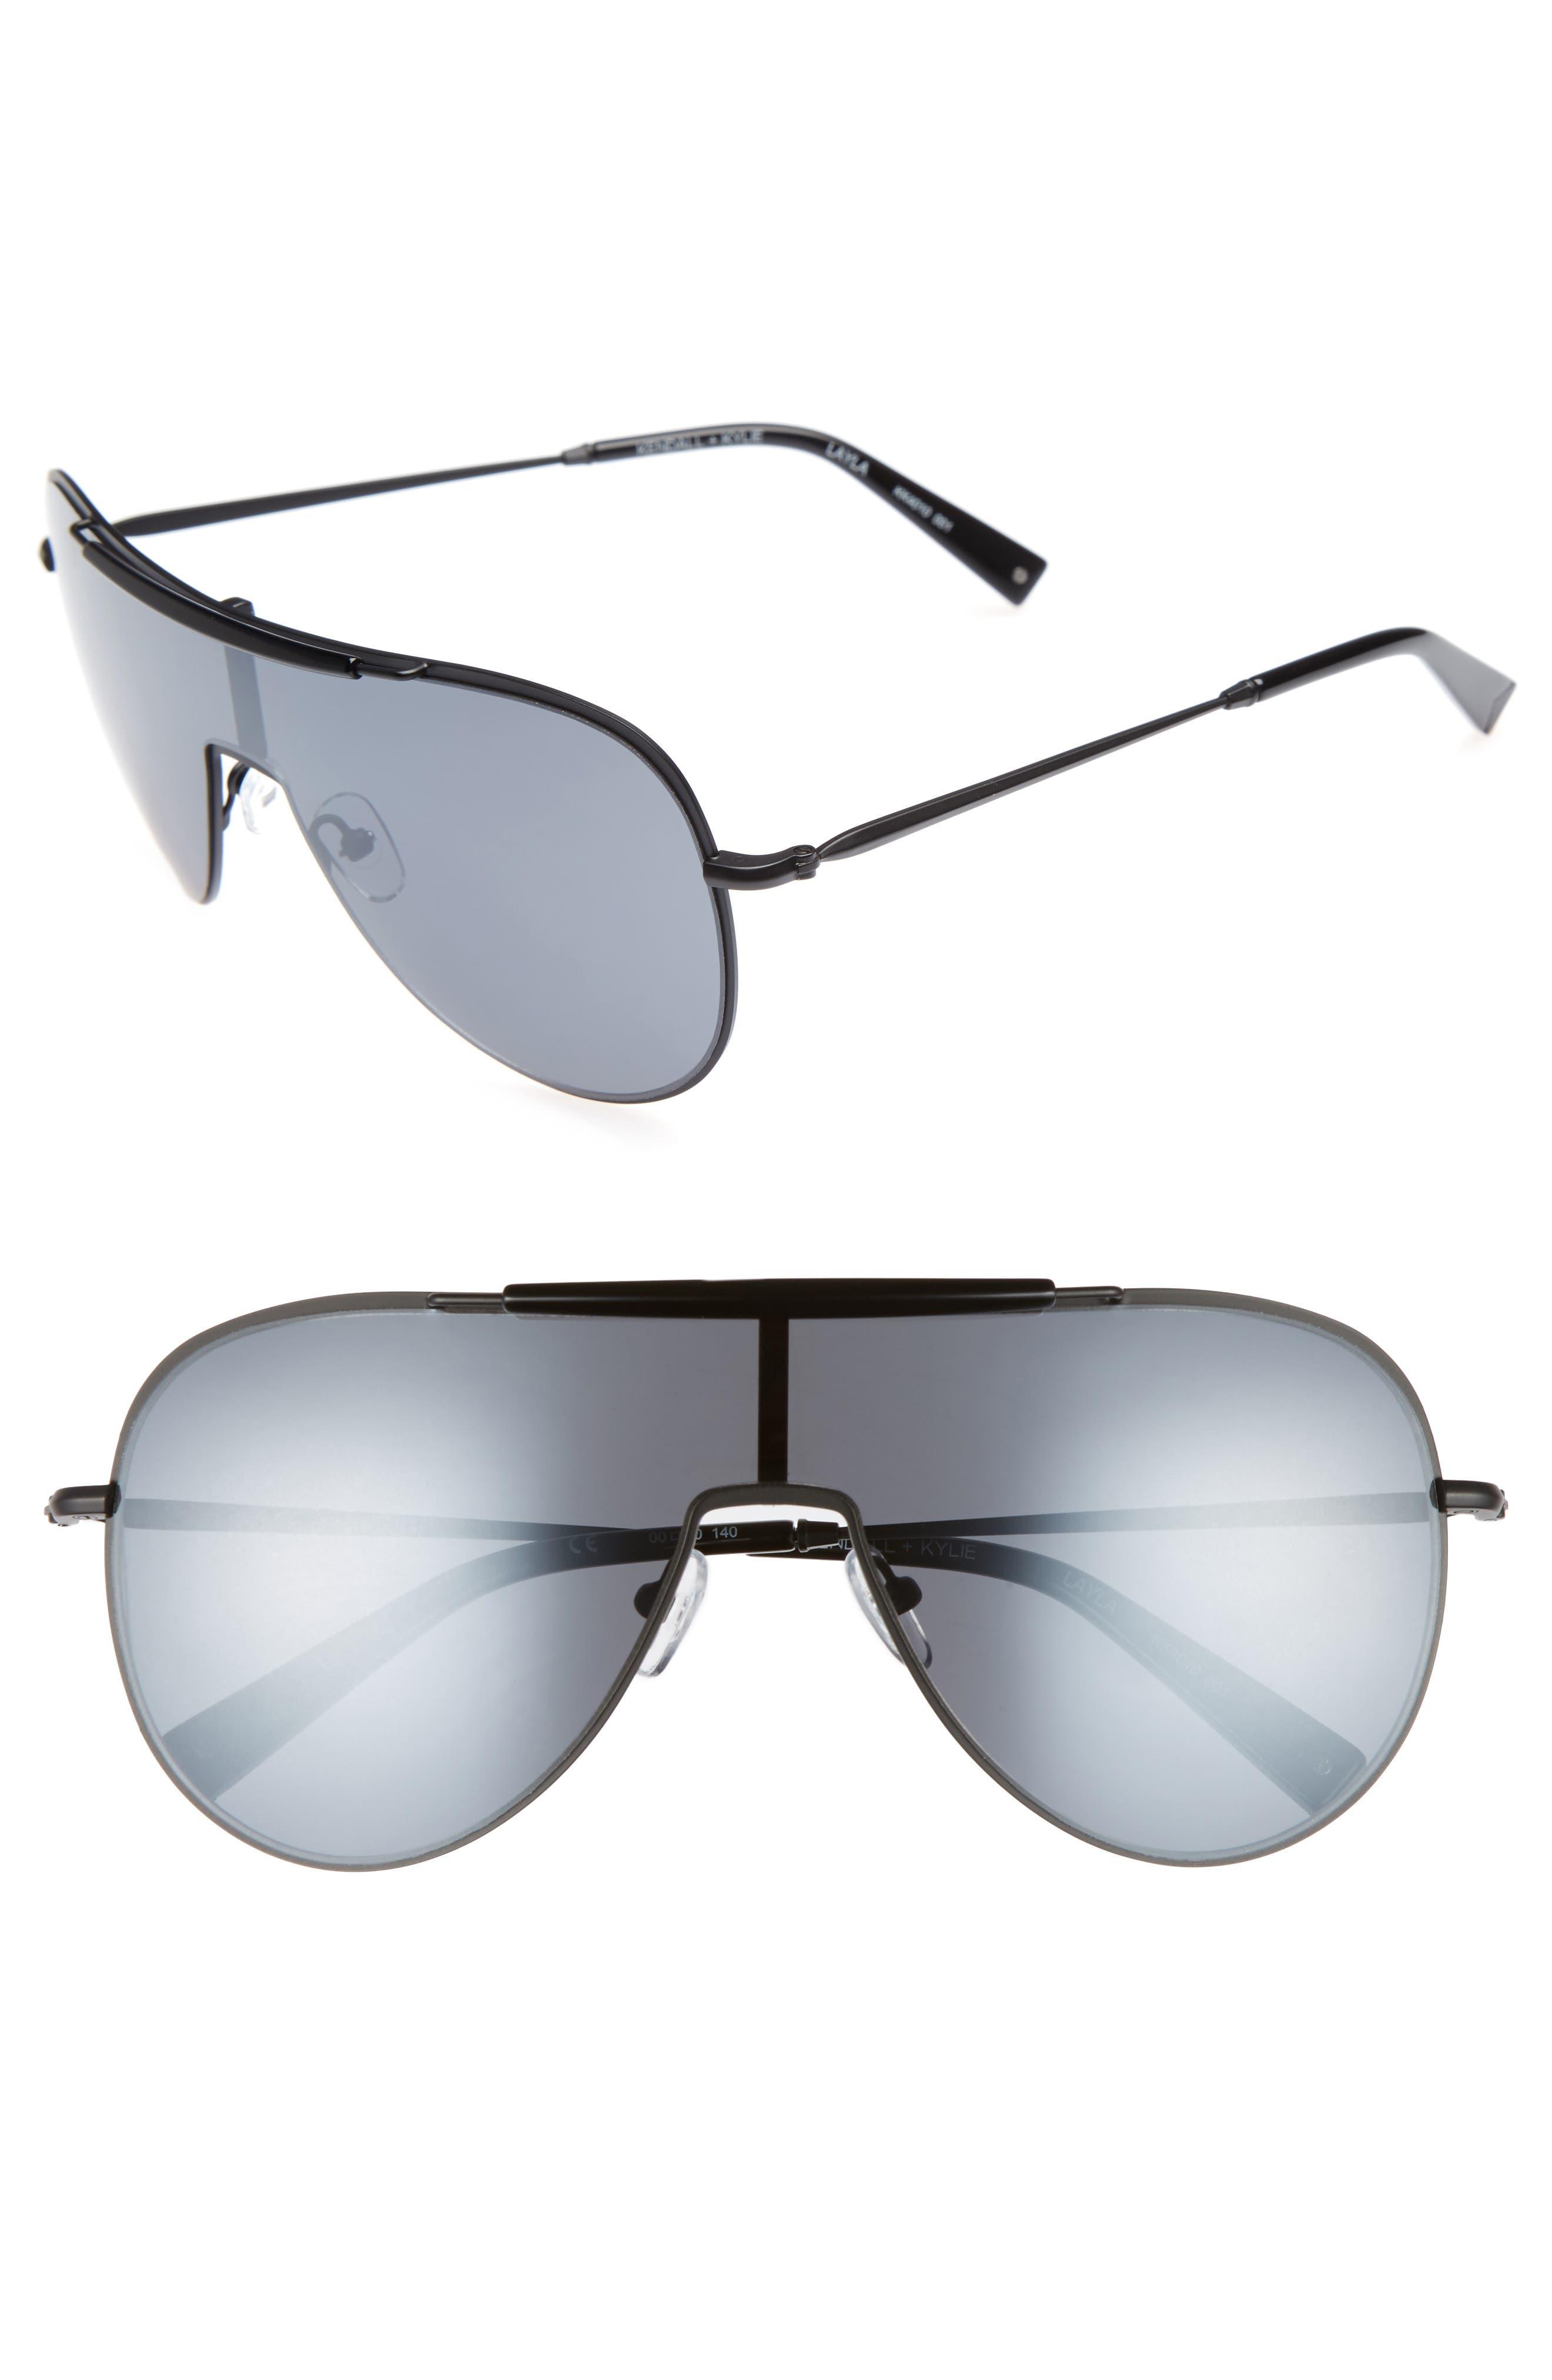 Shield Aviator Sunglasses,                             Main thumbnail 1, color,                             001